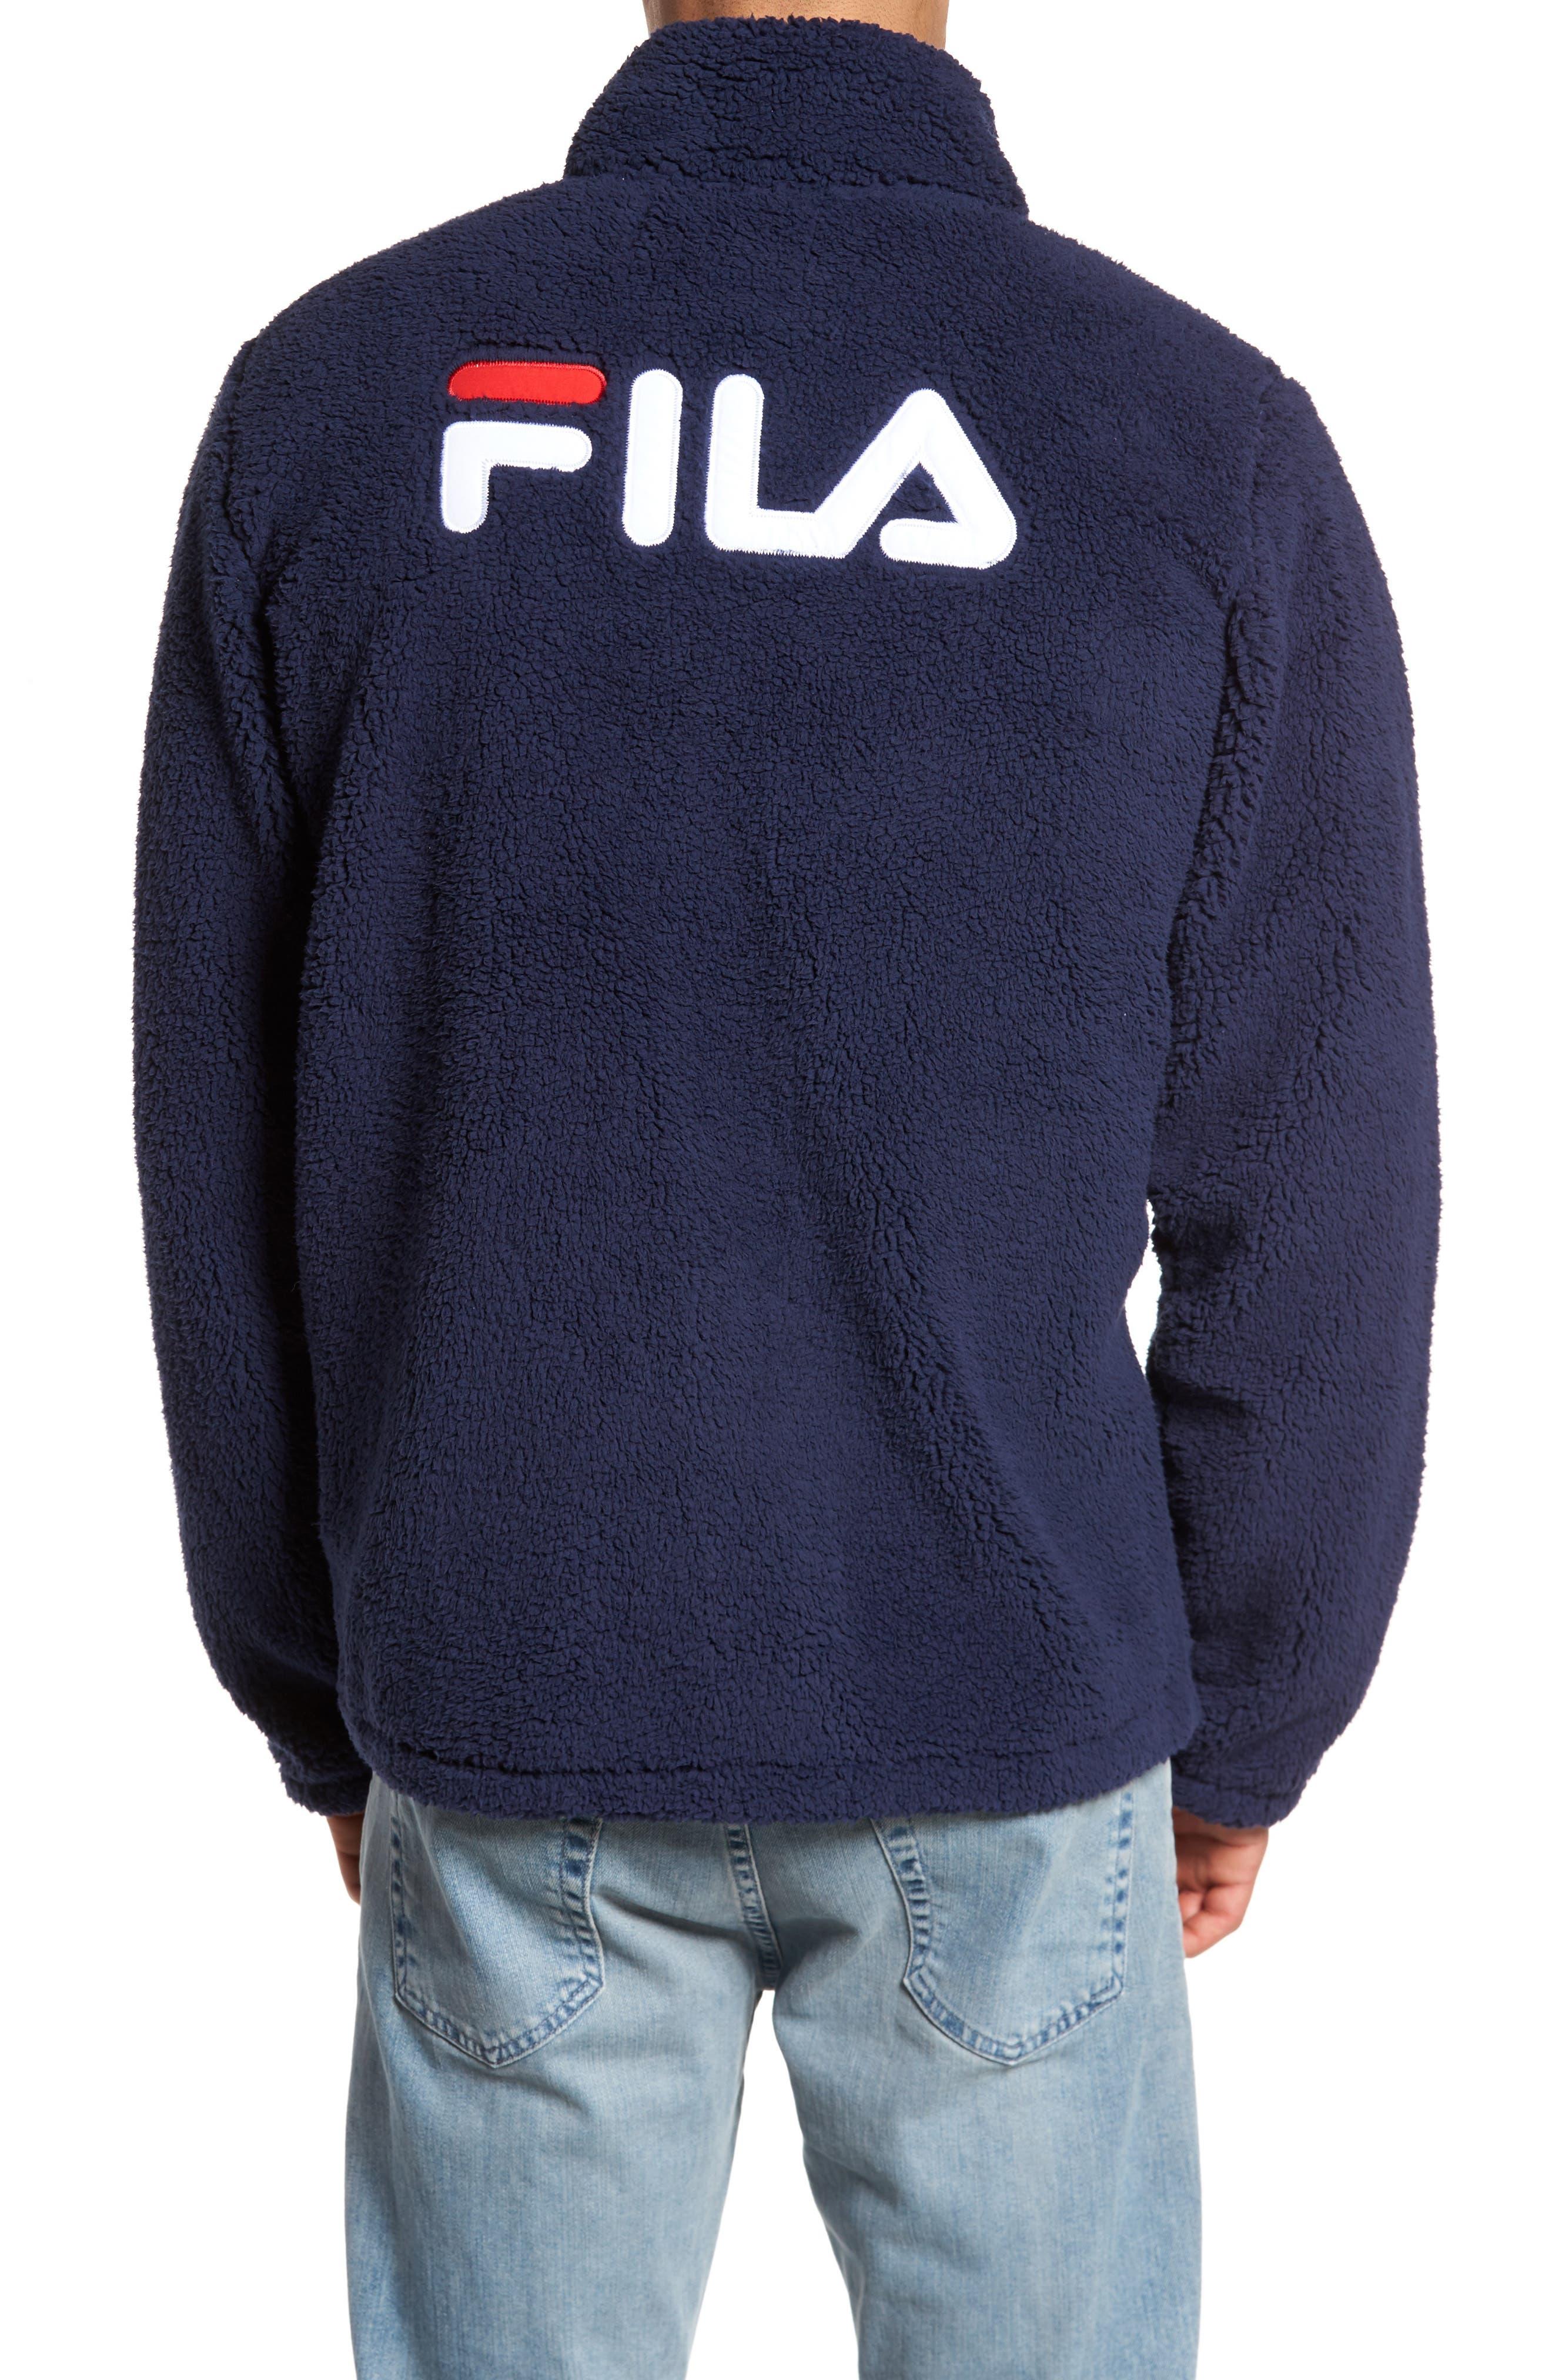 Finlay Fleece Jacket,                             Alternate thumbnail 4, color,